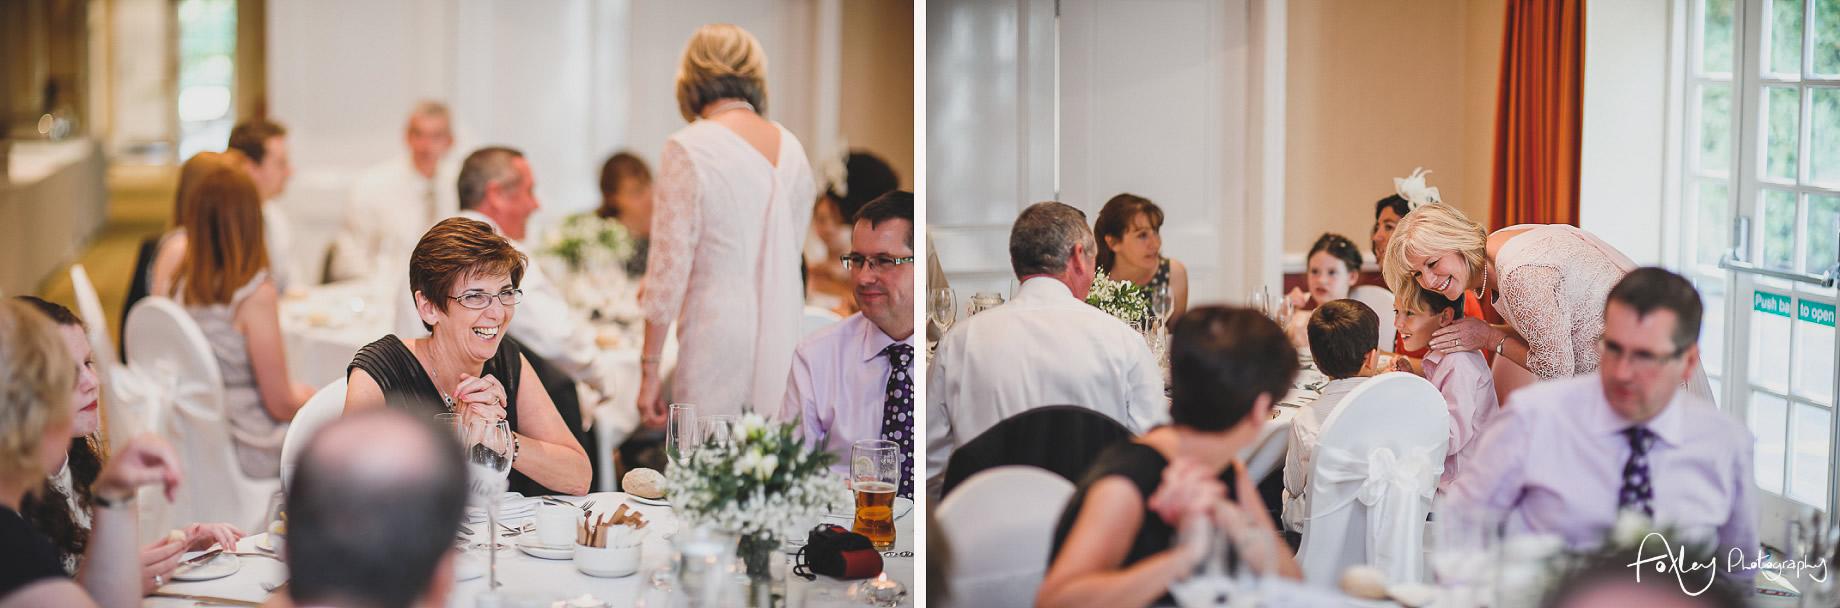 Rebecca and Dan Wedding at Preston Marriott Hotel 103